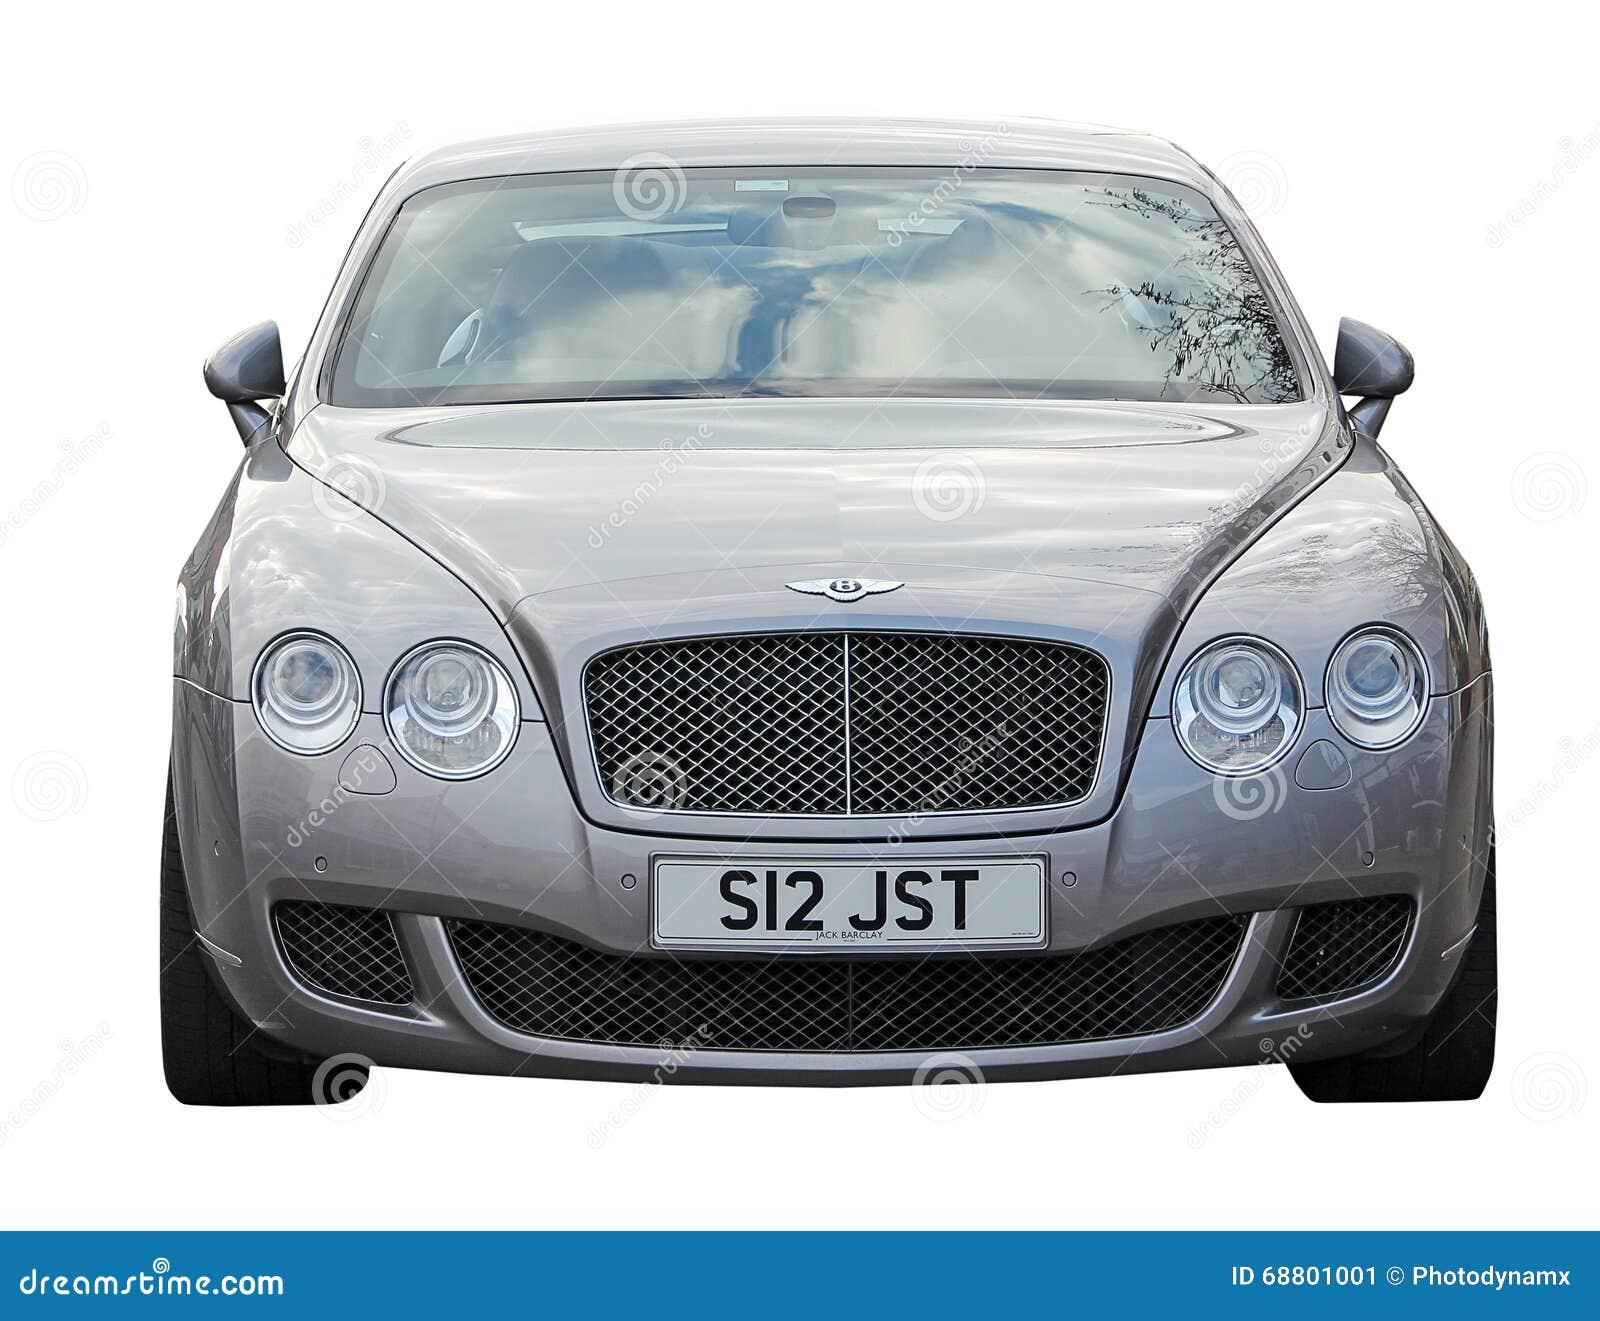 Bentley Car Editorial Photo Image Of Headlamps Radiator 68801001